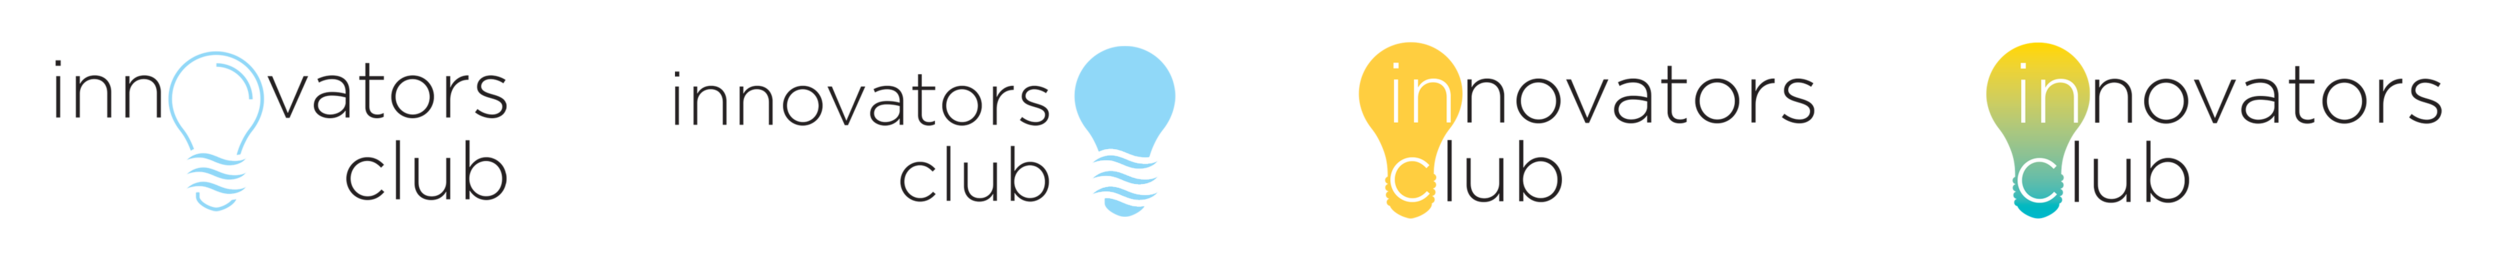 Innovators_club_logos_1.png